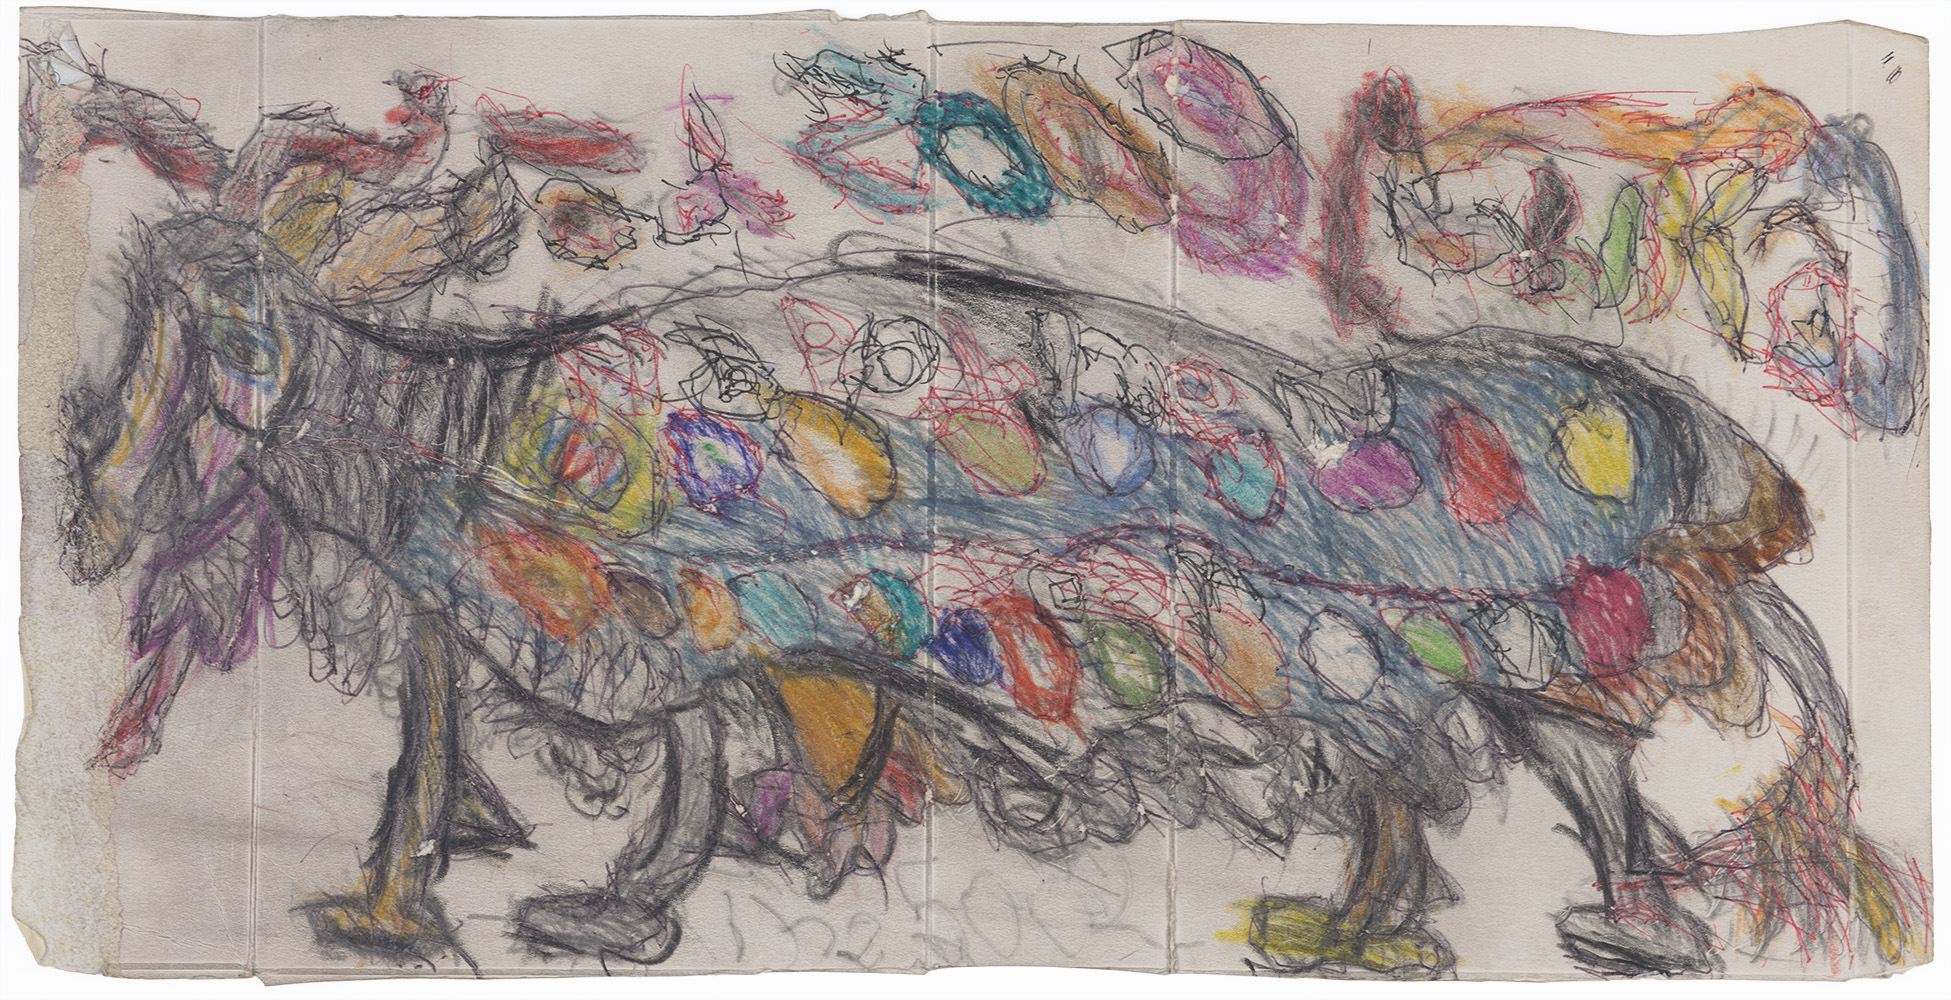 Ilya Natarevich,   Untitled  , 2015,Ink, graphite, crayon on cardboard,8.75 x 17.25 inches,22.2 x 43.8 cm,INa 6